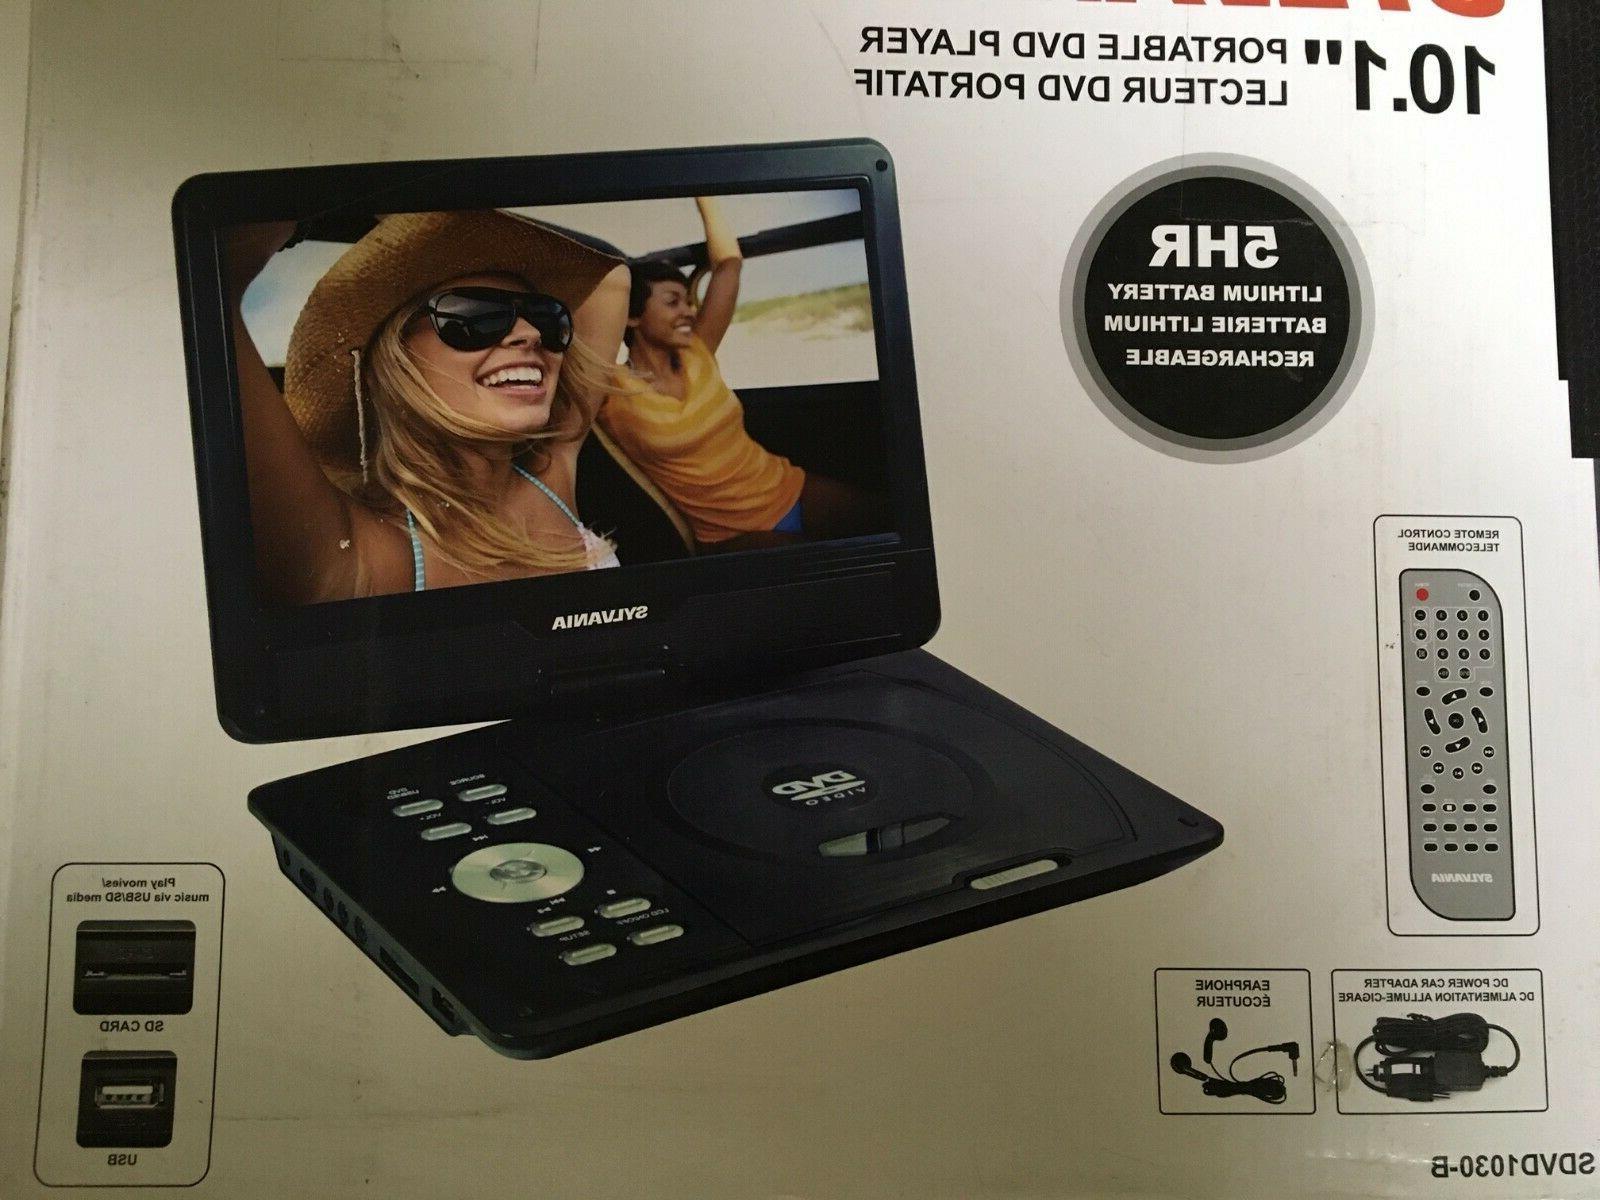 Sylvania Media sale, models, gift idea